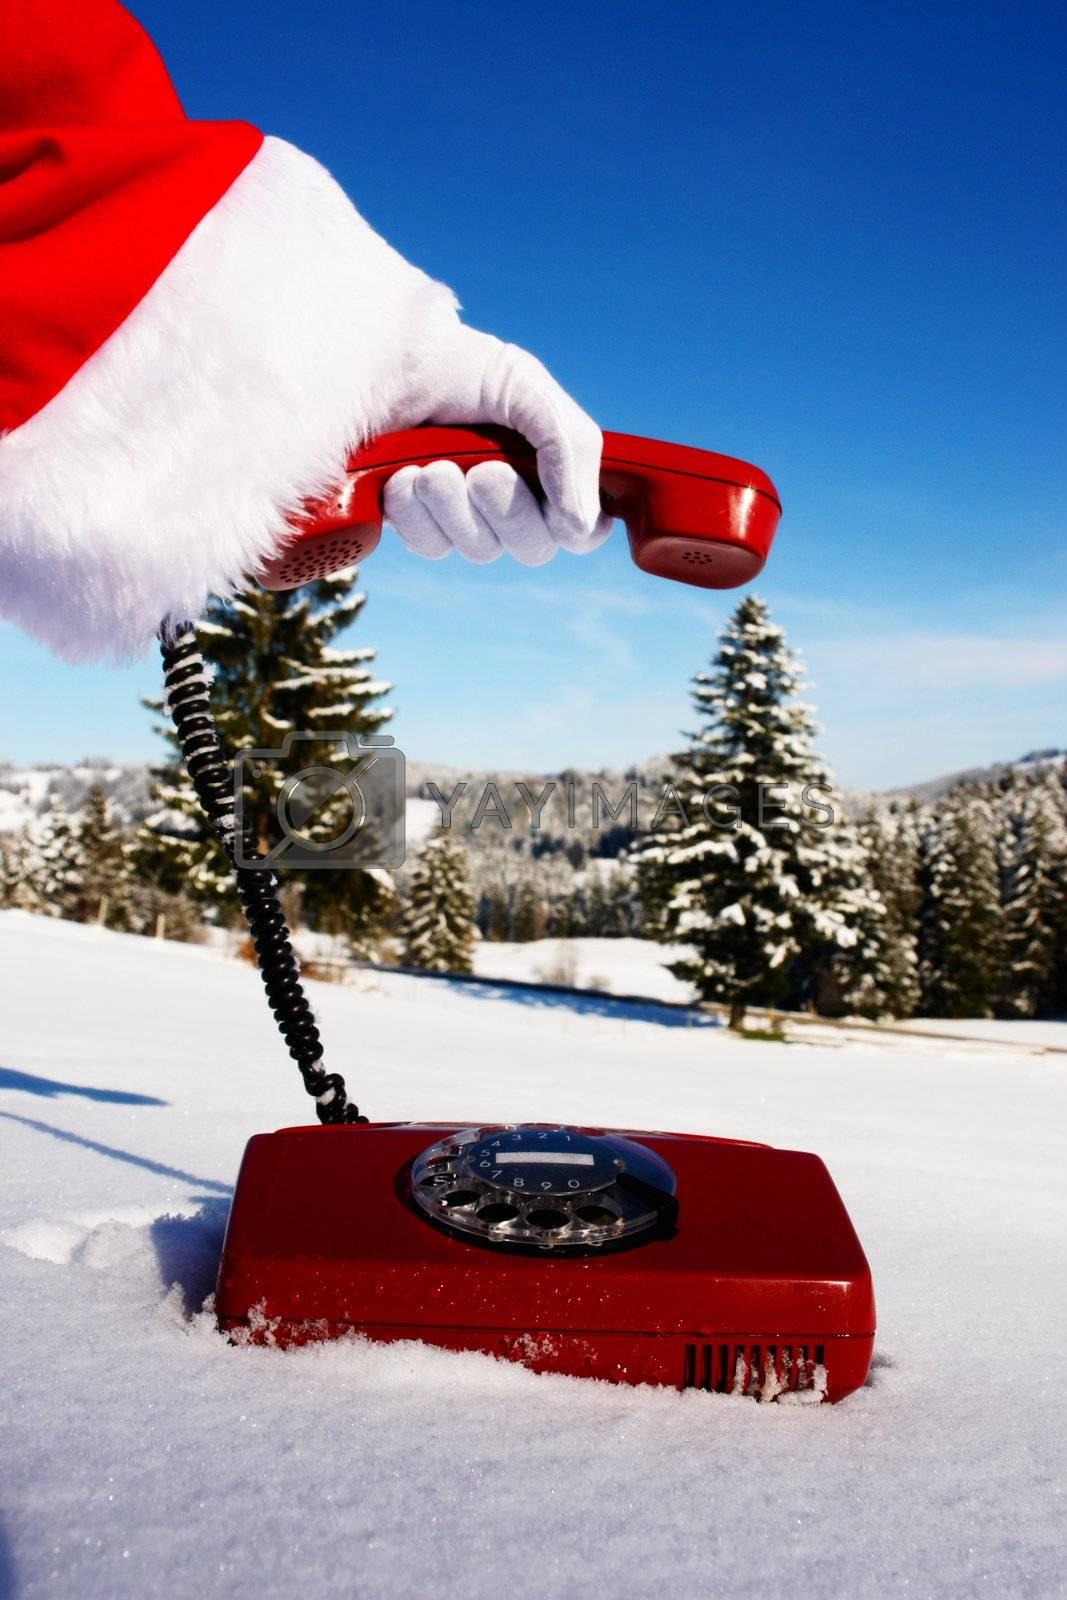 Santa Claus Hotline symbolized by a red retro phone...